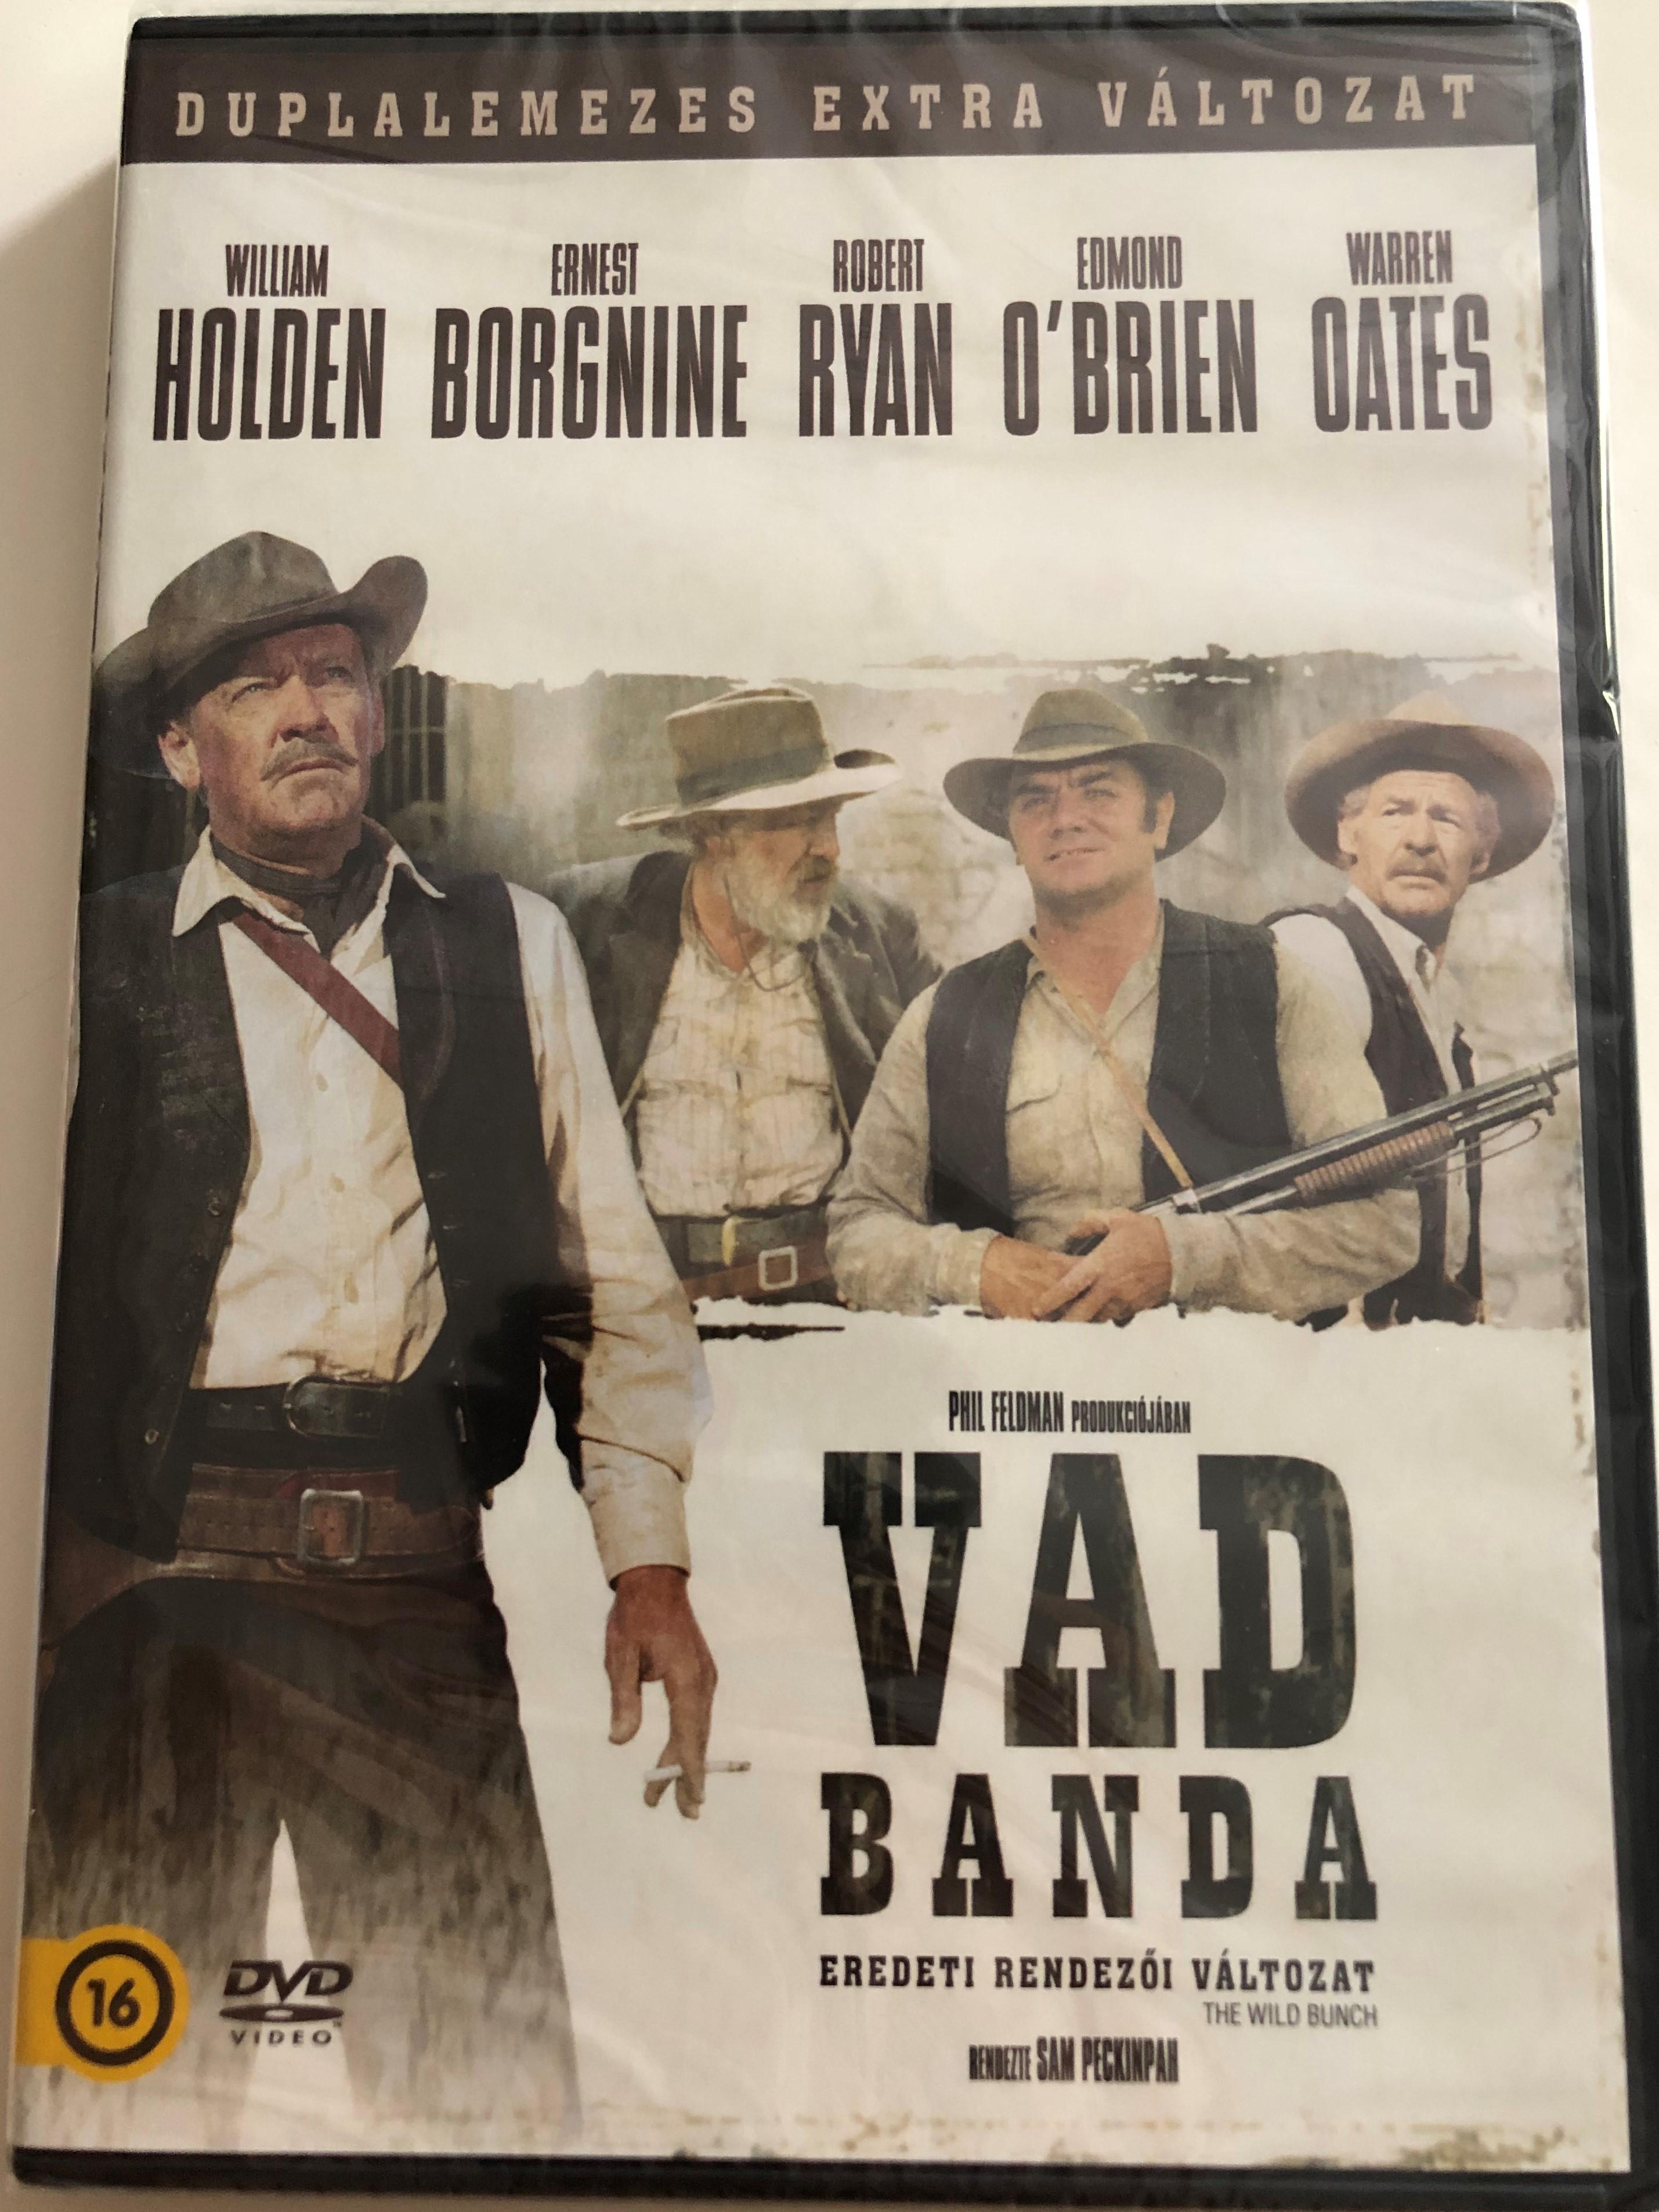 the-wild-bunch-dvd-1969-vad-banda-duplalemezes-extra-v-ltozat-directed-by-sam-peckinpah-starring-william-holdren-ernest-borgnine-robert-ryan-edmond-o-brien-warren-oates-2-disc-special-edition-original-director-s-cut-1-.jpg